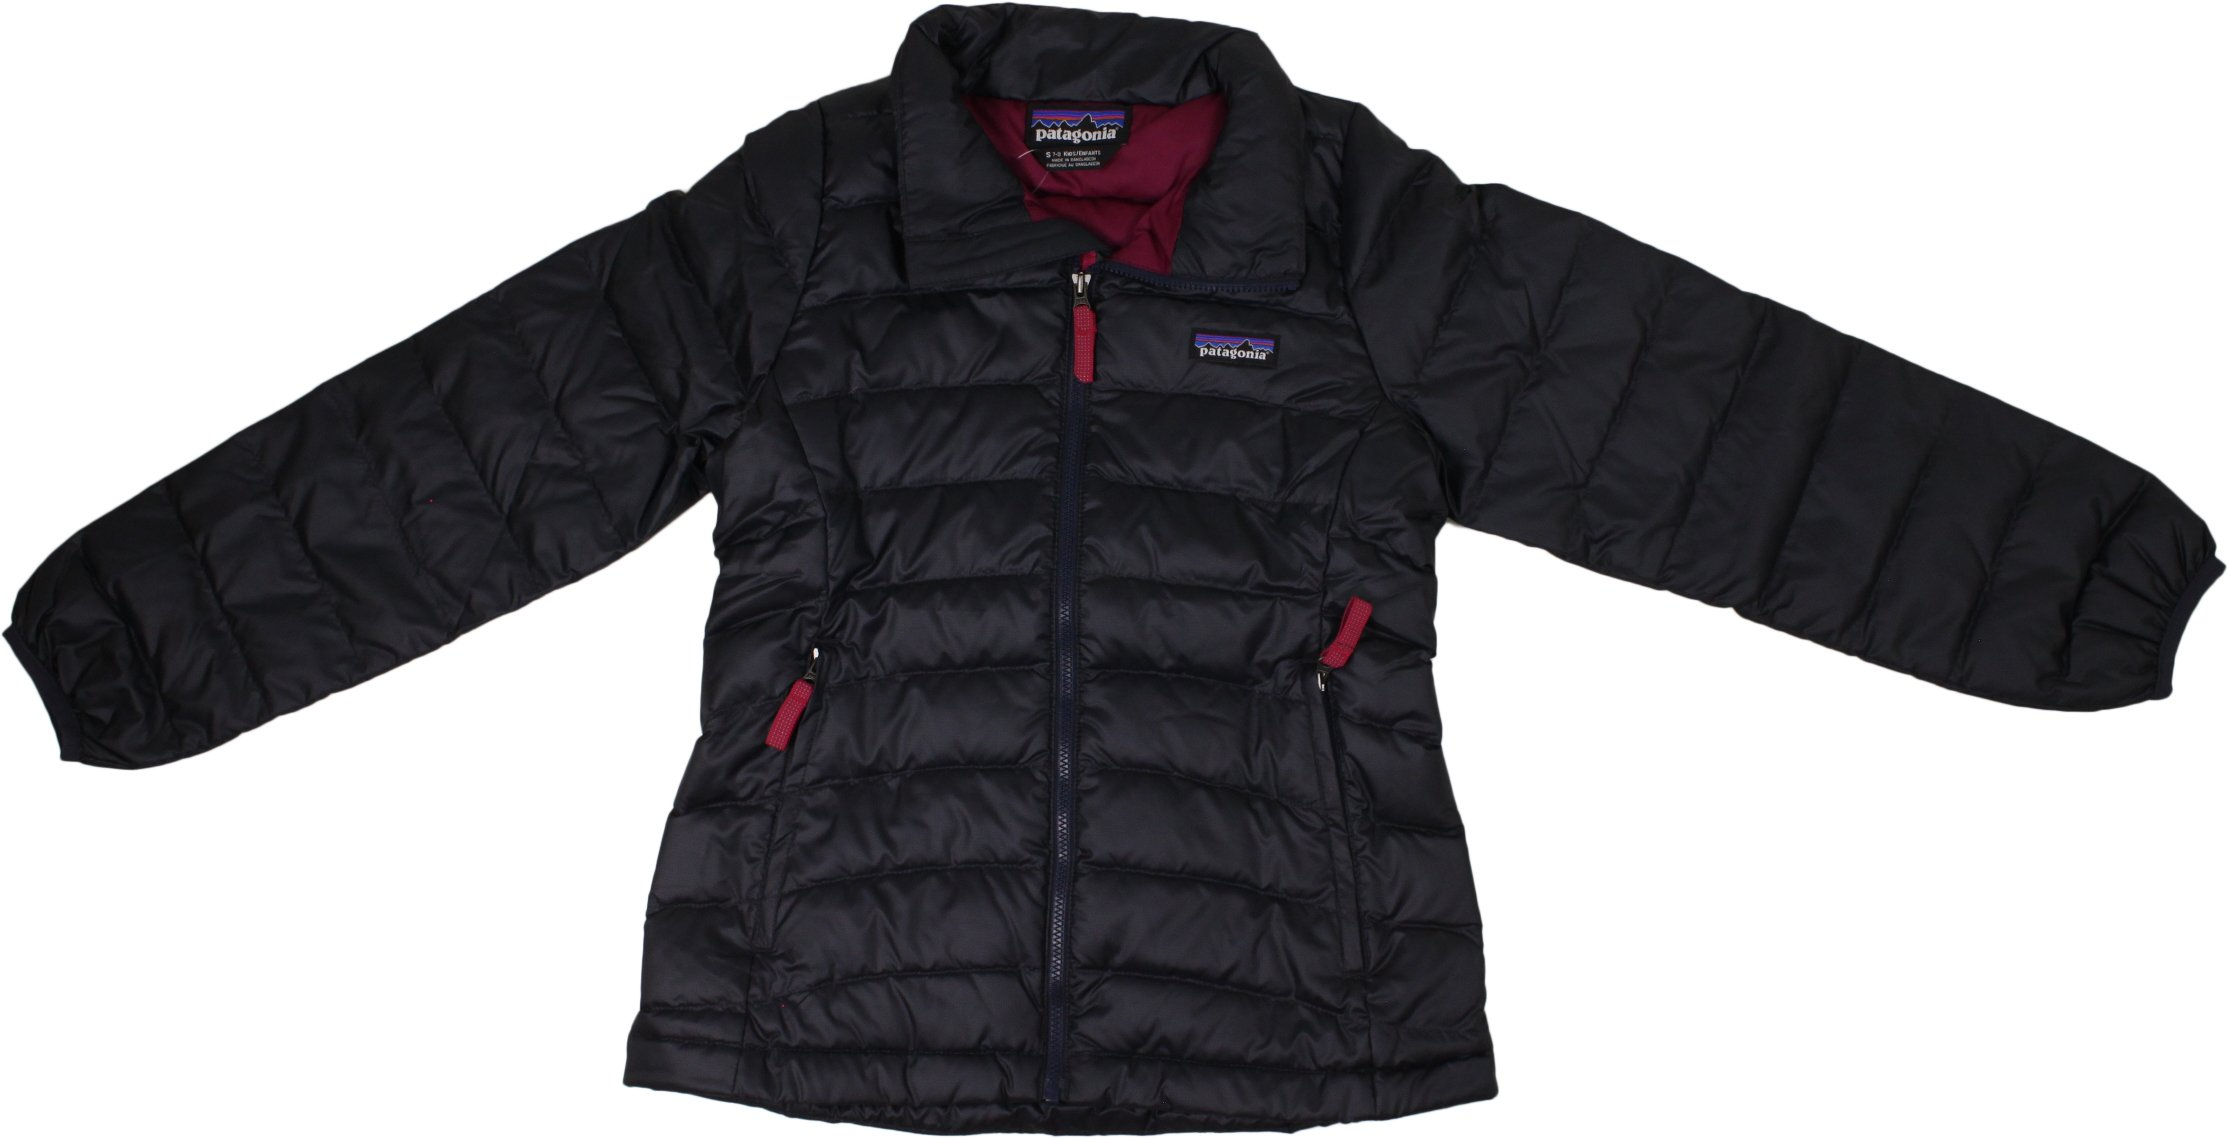 Patagonia G Down Sweater Jacket Smolder Blue Girls S by Patagonia